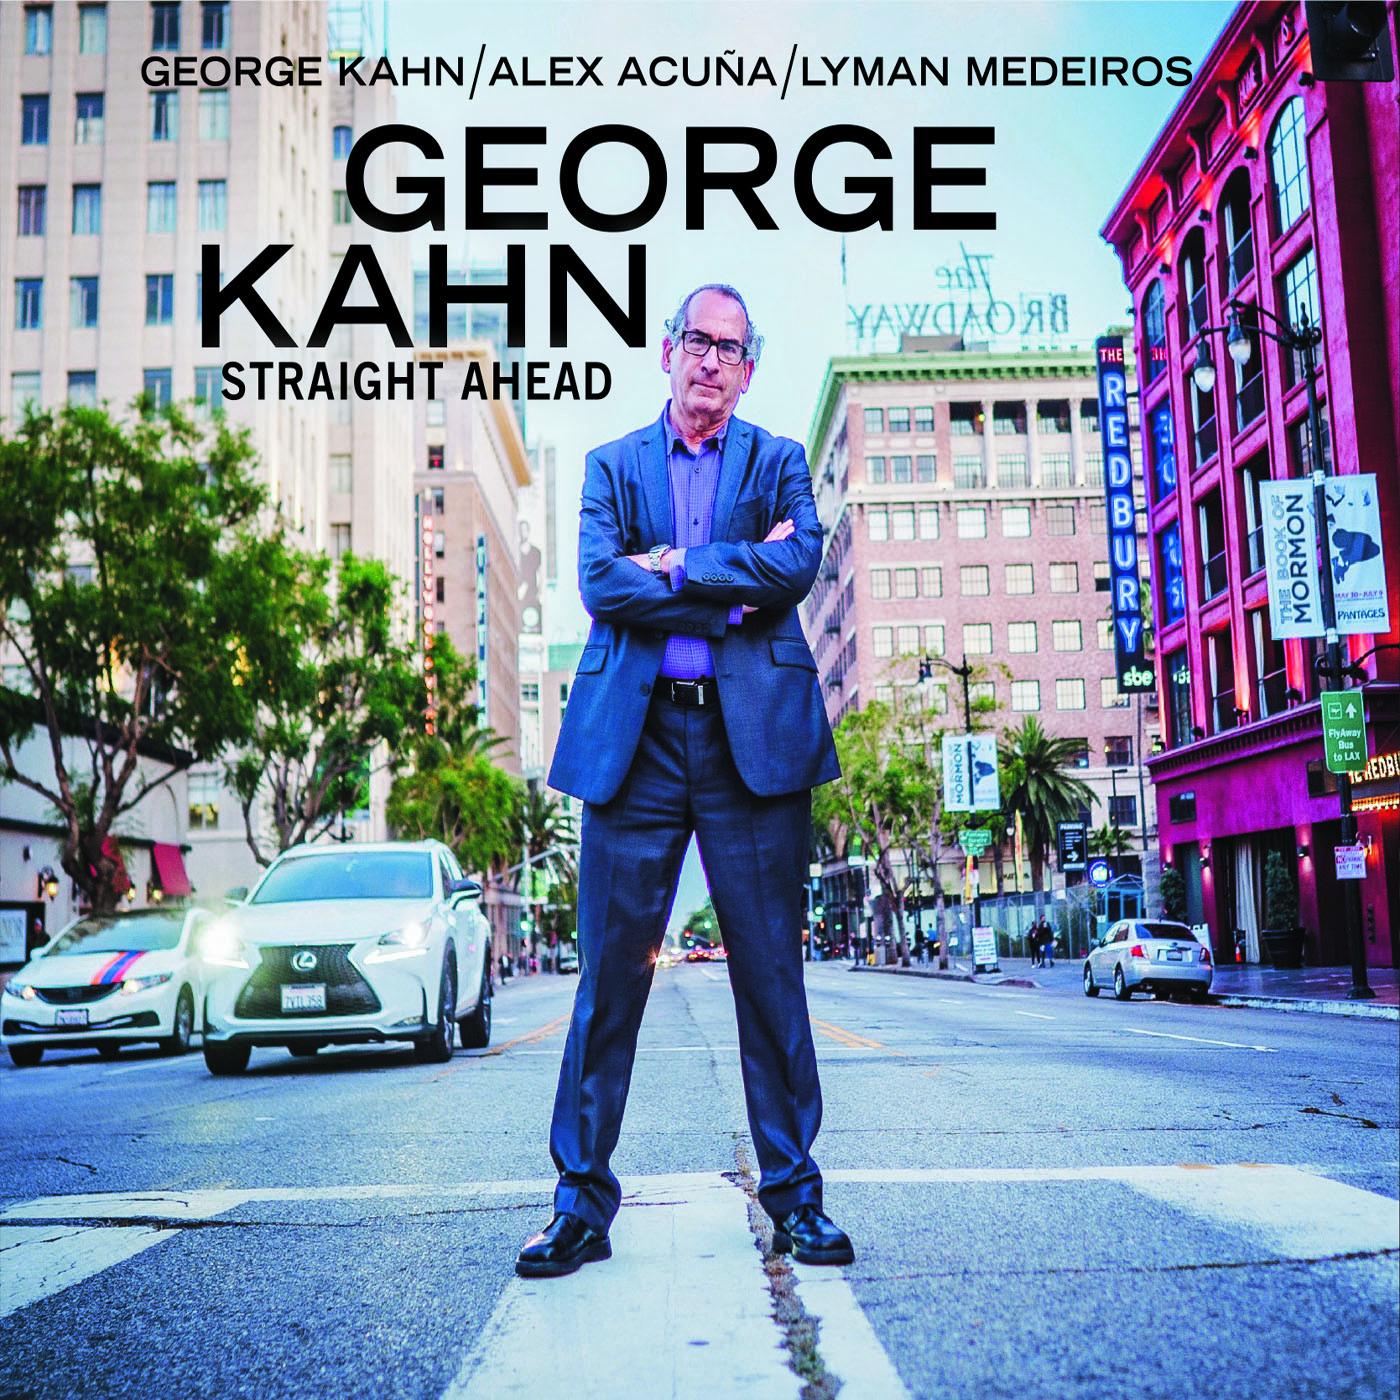 Image result for George Kahn STRAIGHT AHEAD